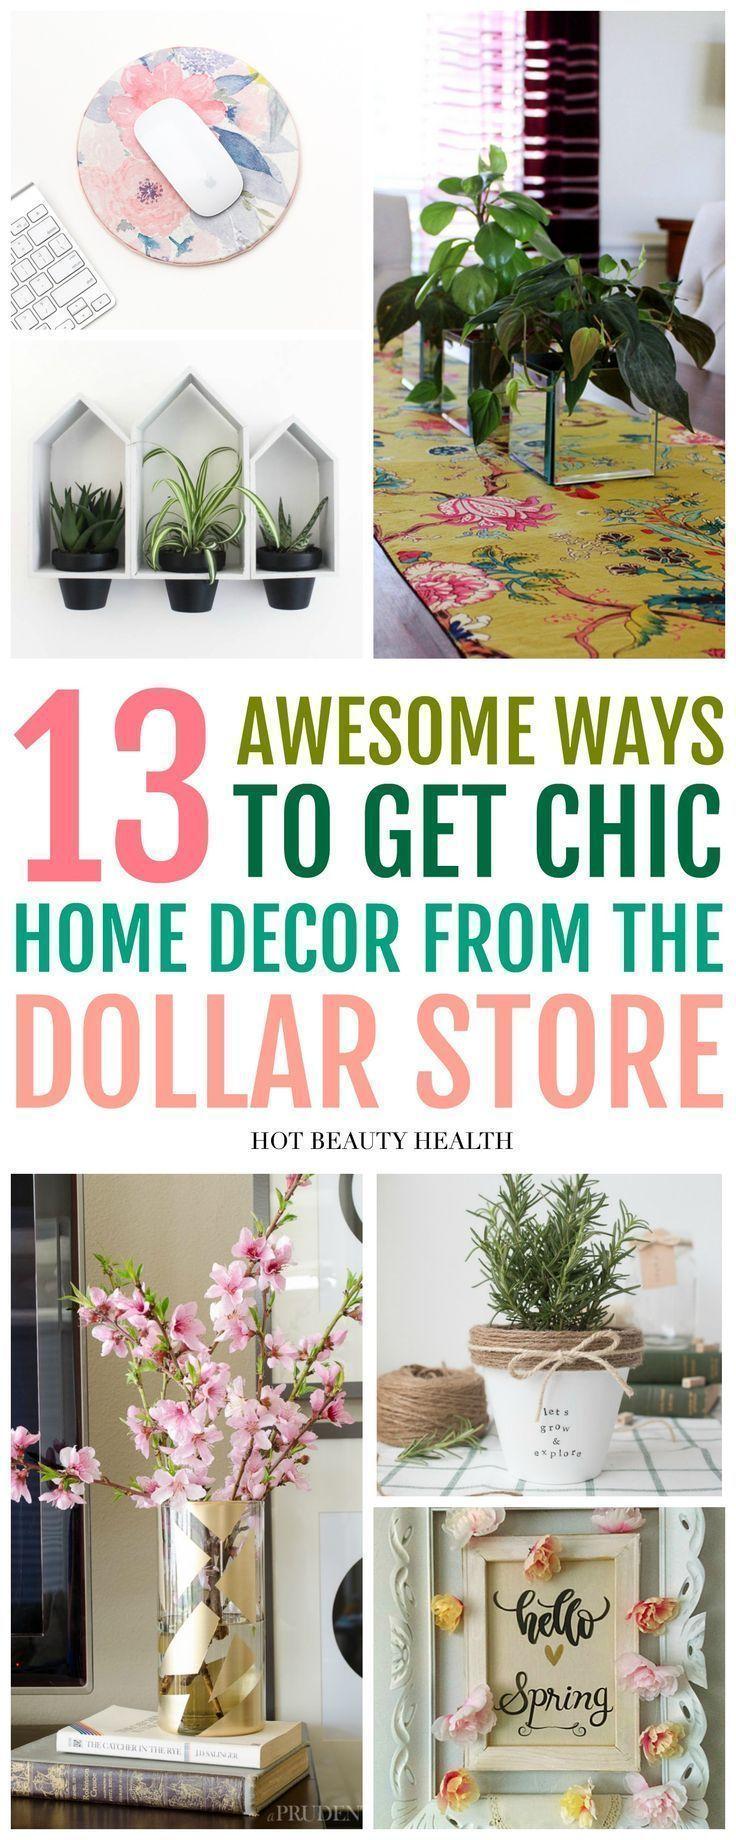 13 Dollar Store Home Decor Ideas You'll Love